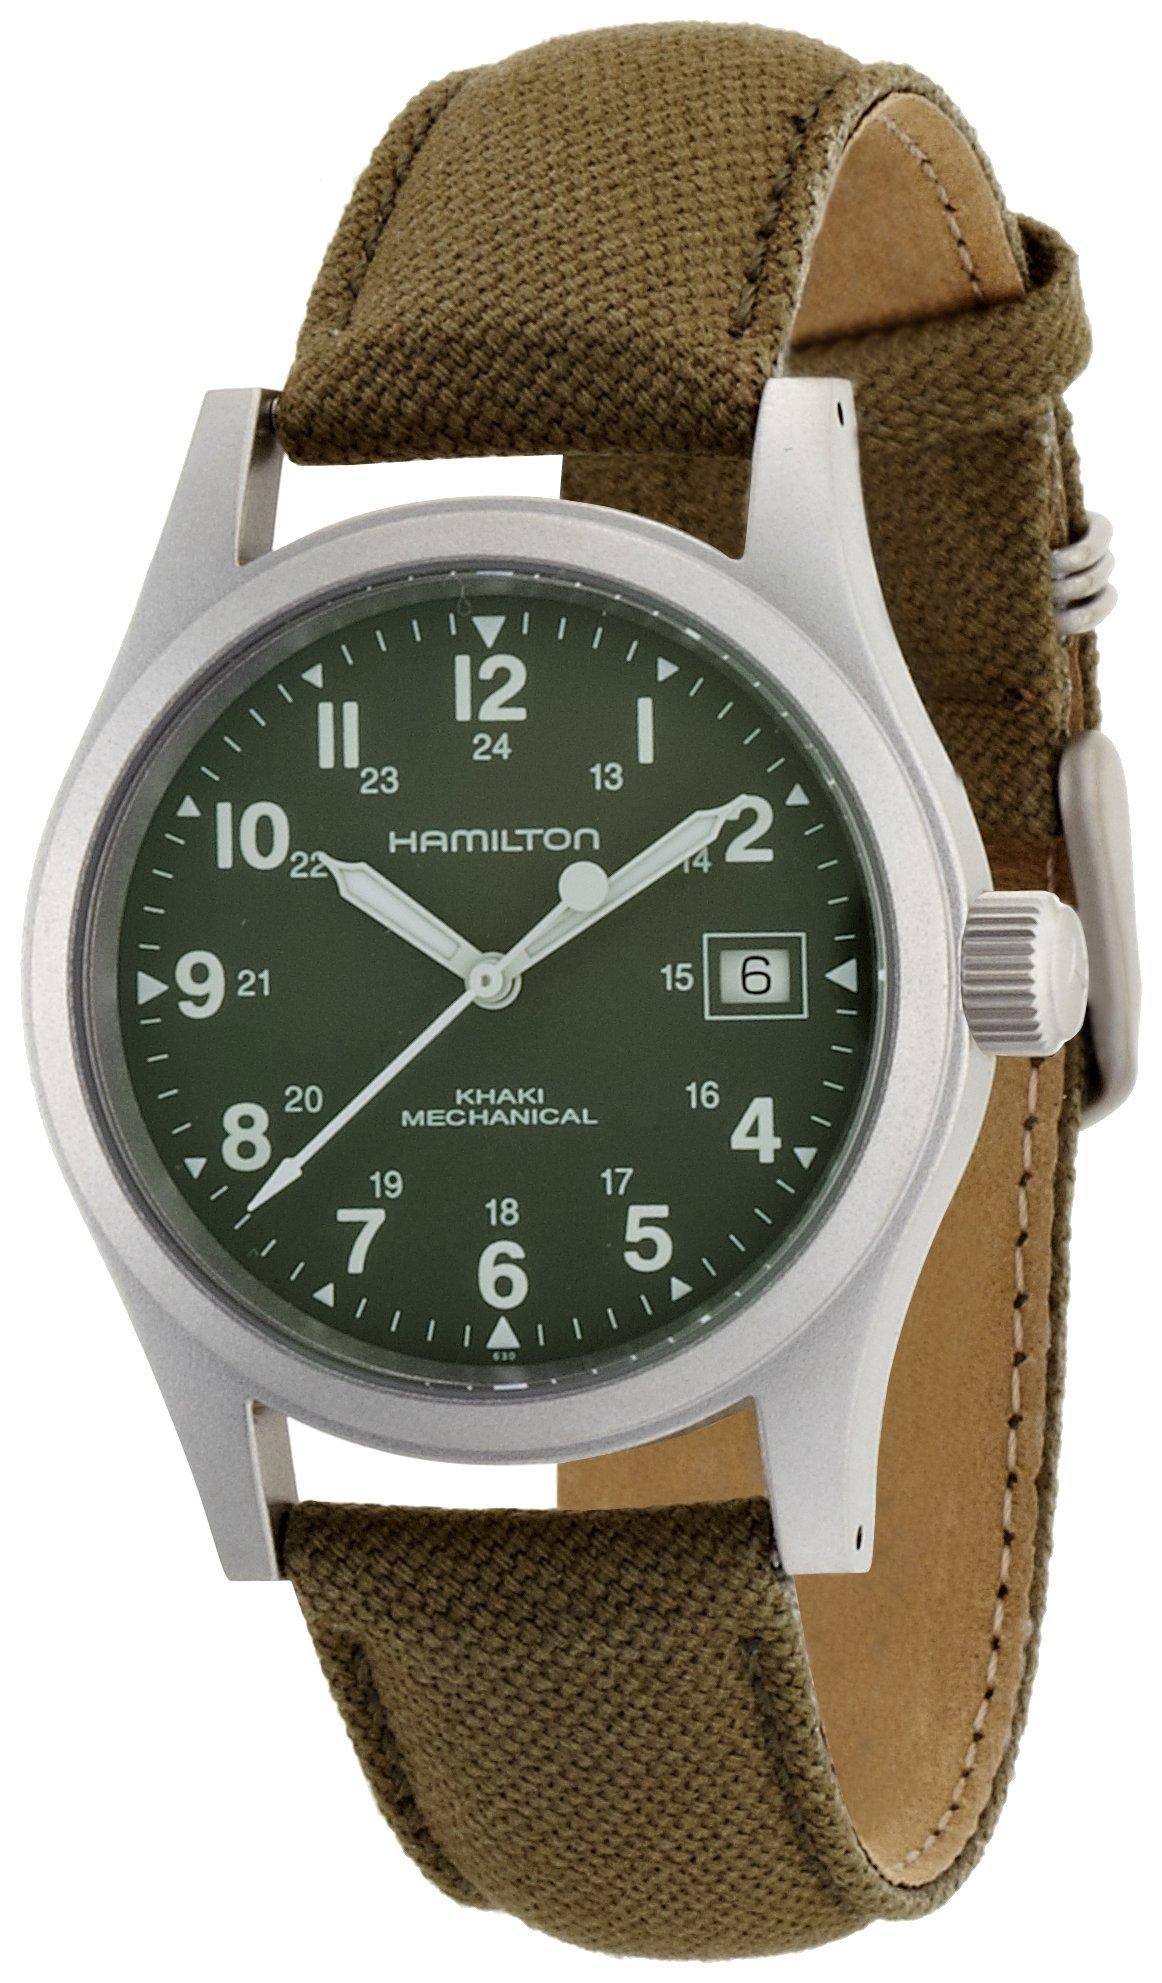 Hamilton – Men's Watch H69419363